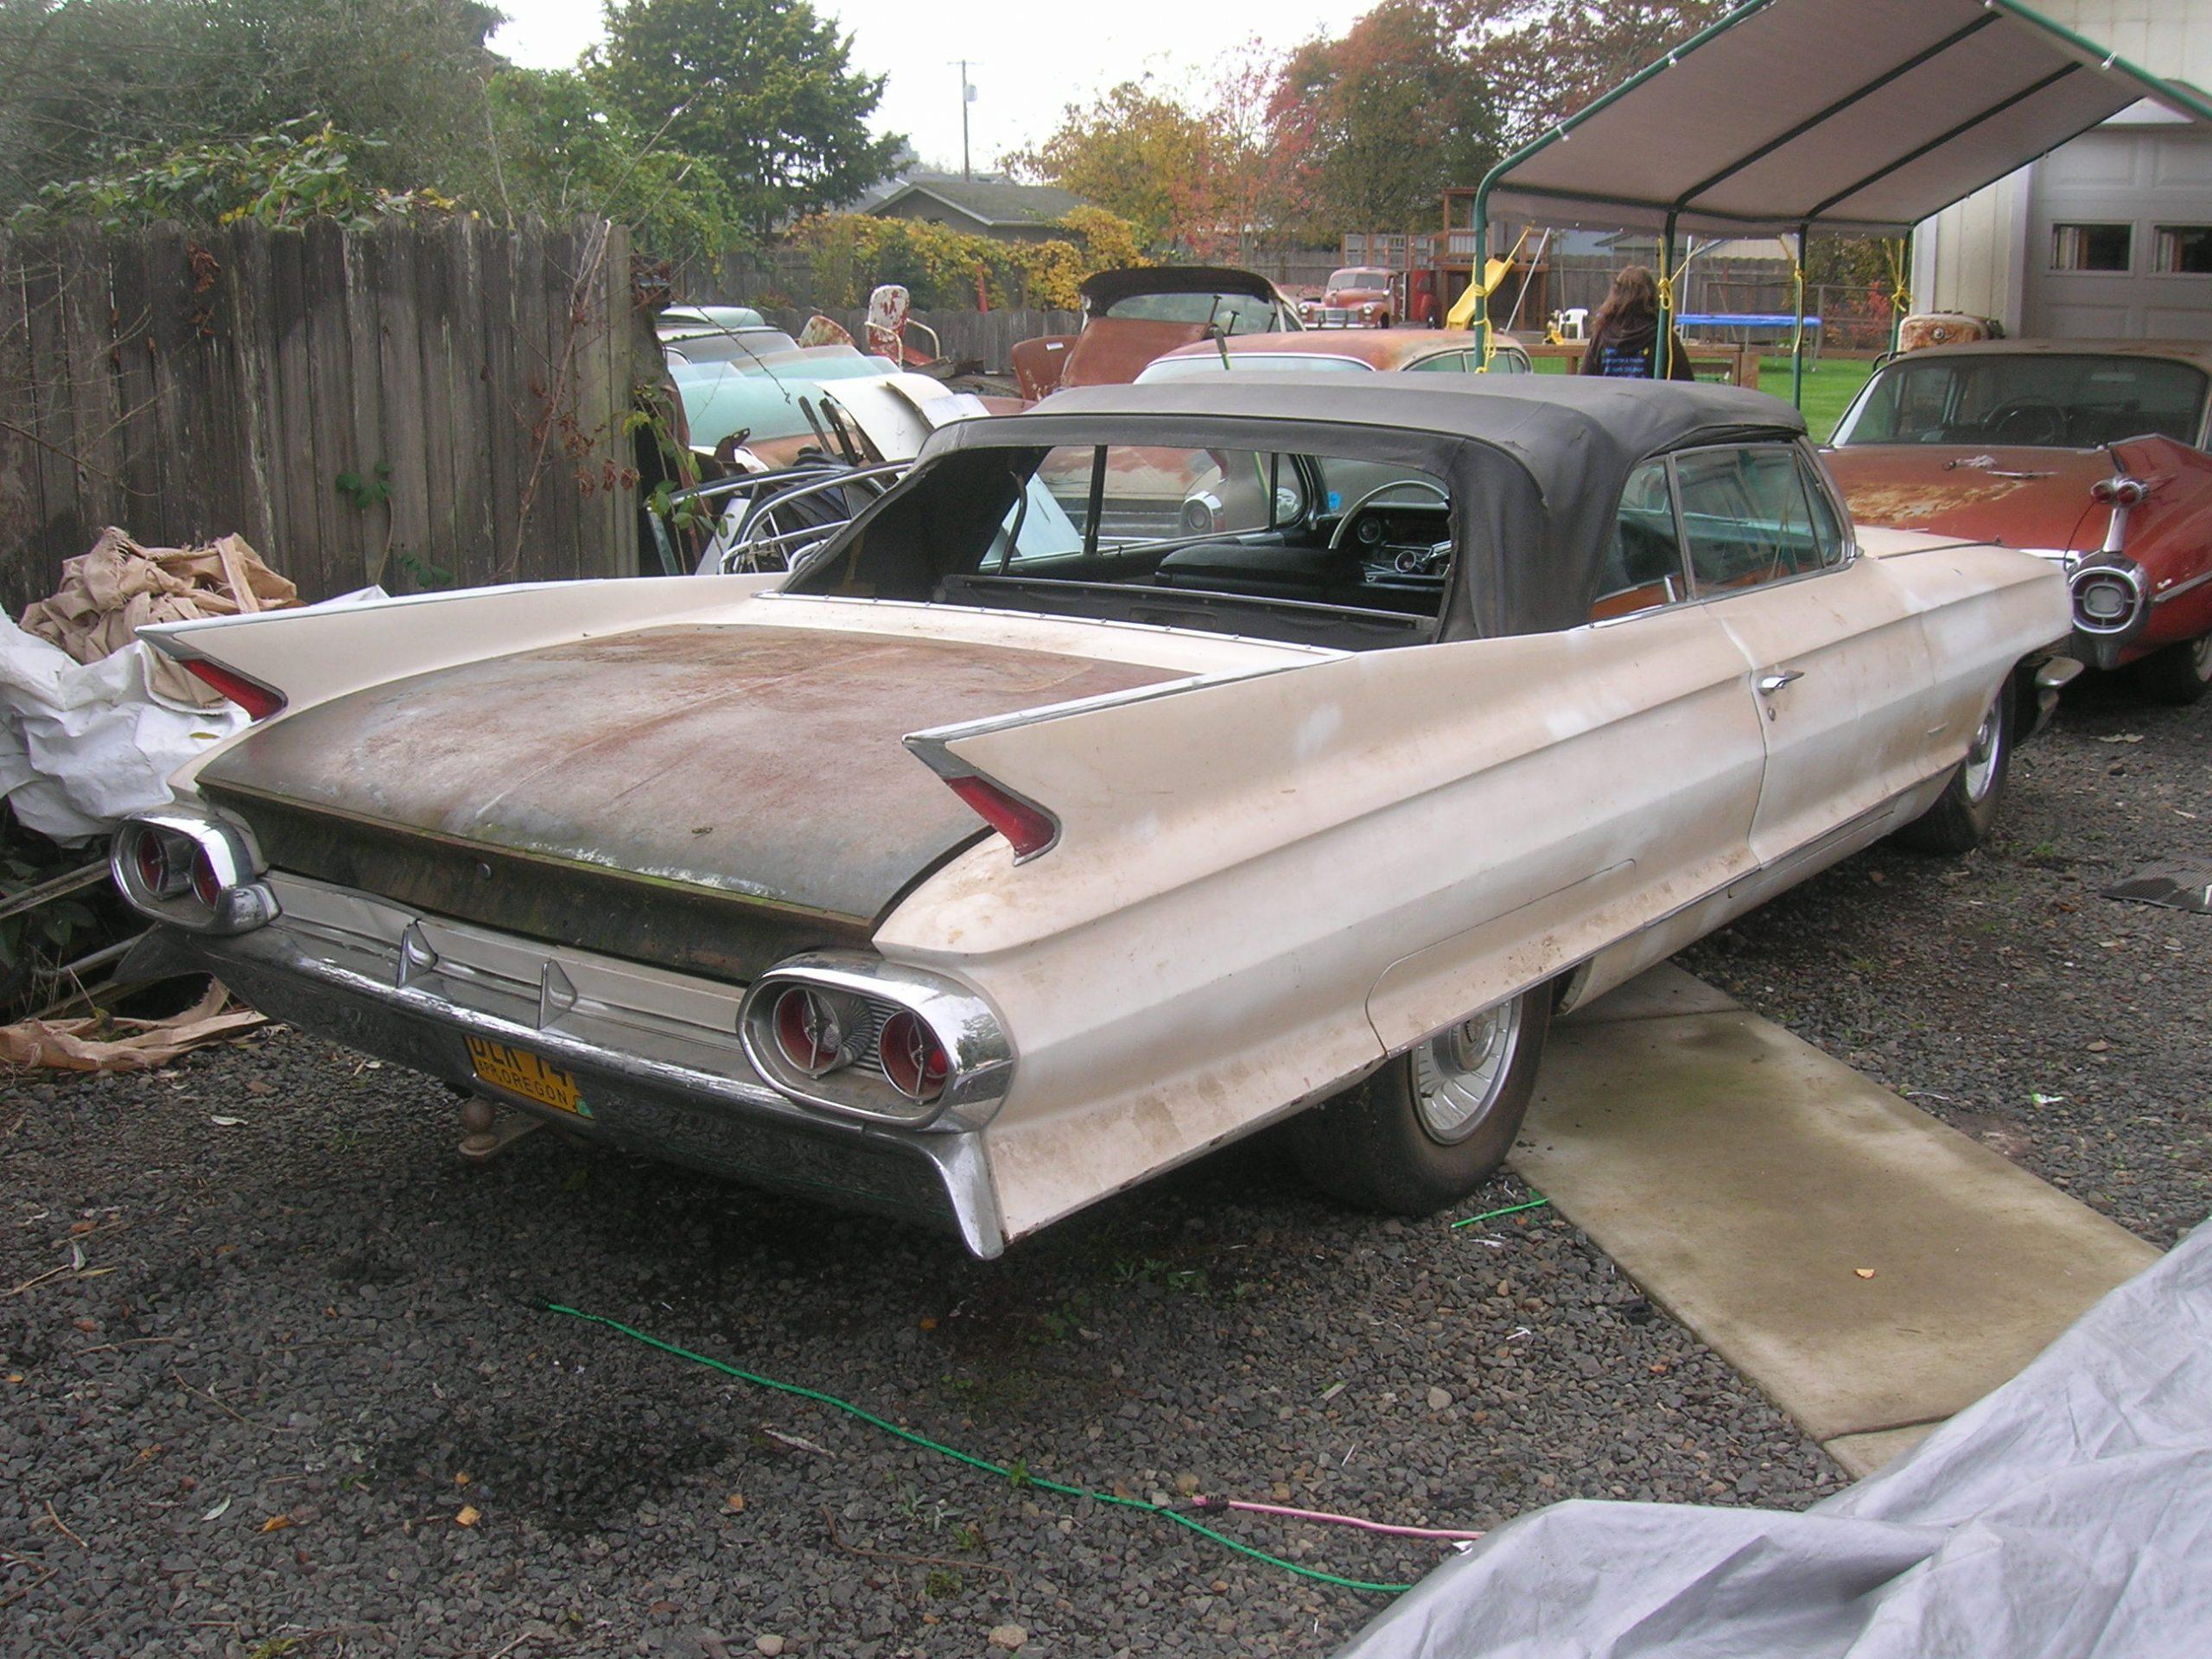 patina old vintage cadillac fins rear three-quarter